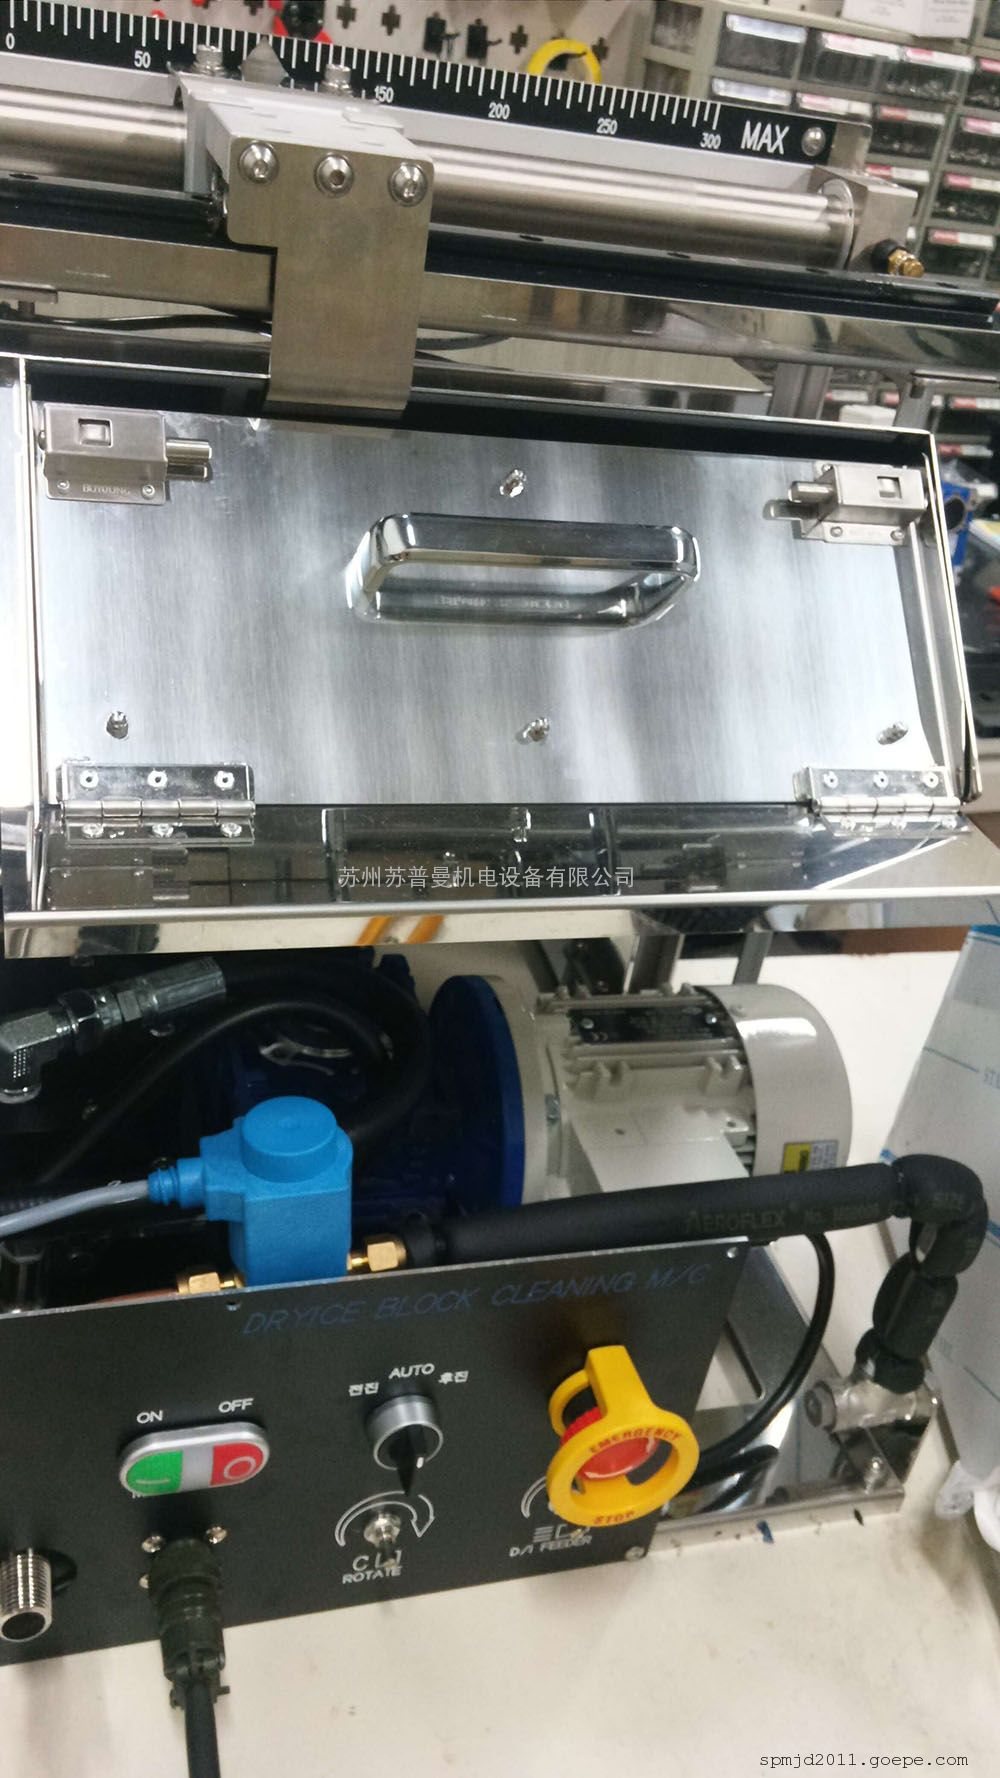 T3液�B二氧化碳清洗�C+固�B二氧化碳清洗�C(干冰清洗�C)